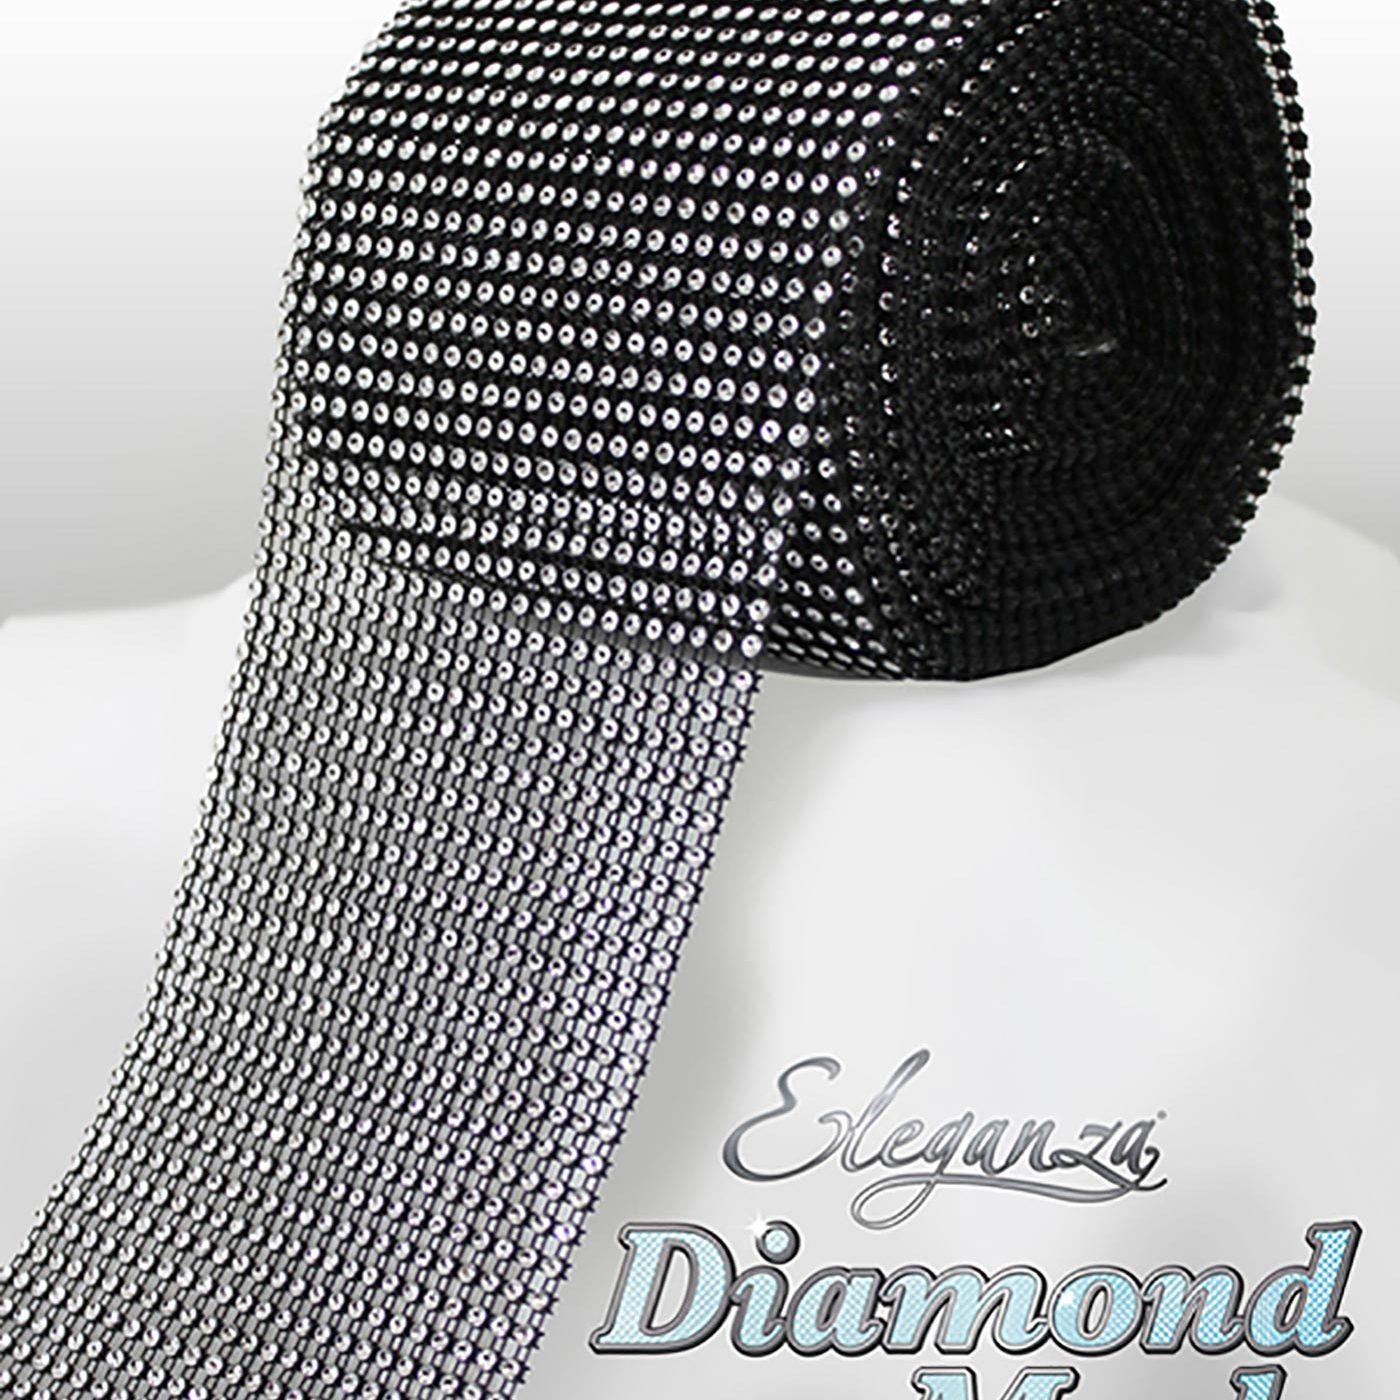 Eleganza Diamond Mesh 12cm x 9m Black/Silver